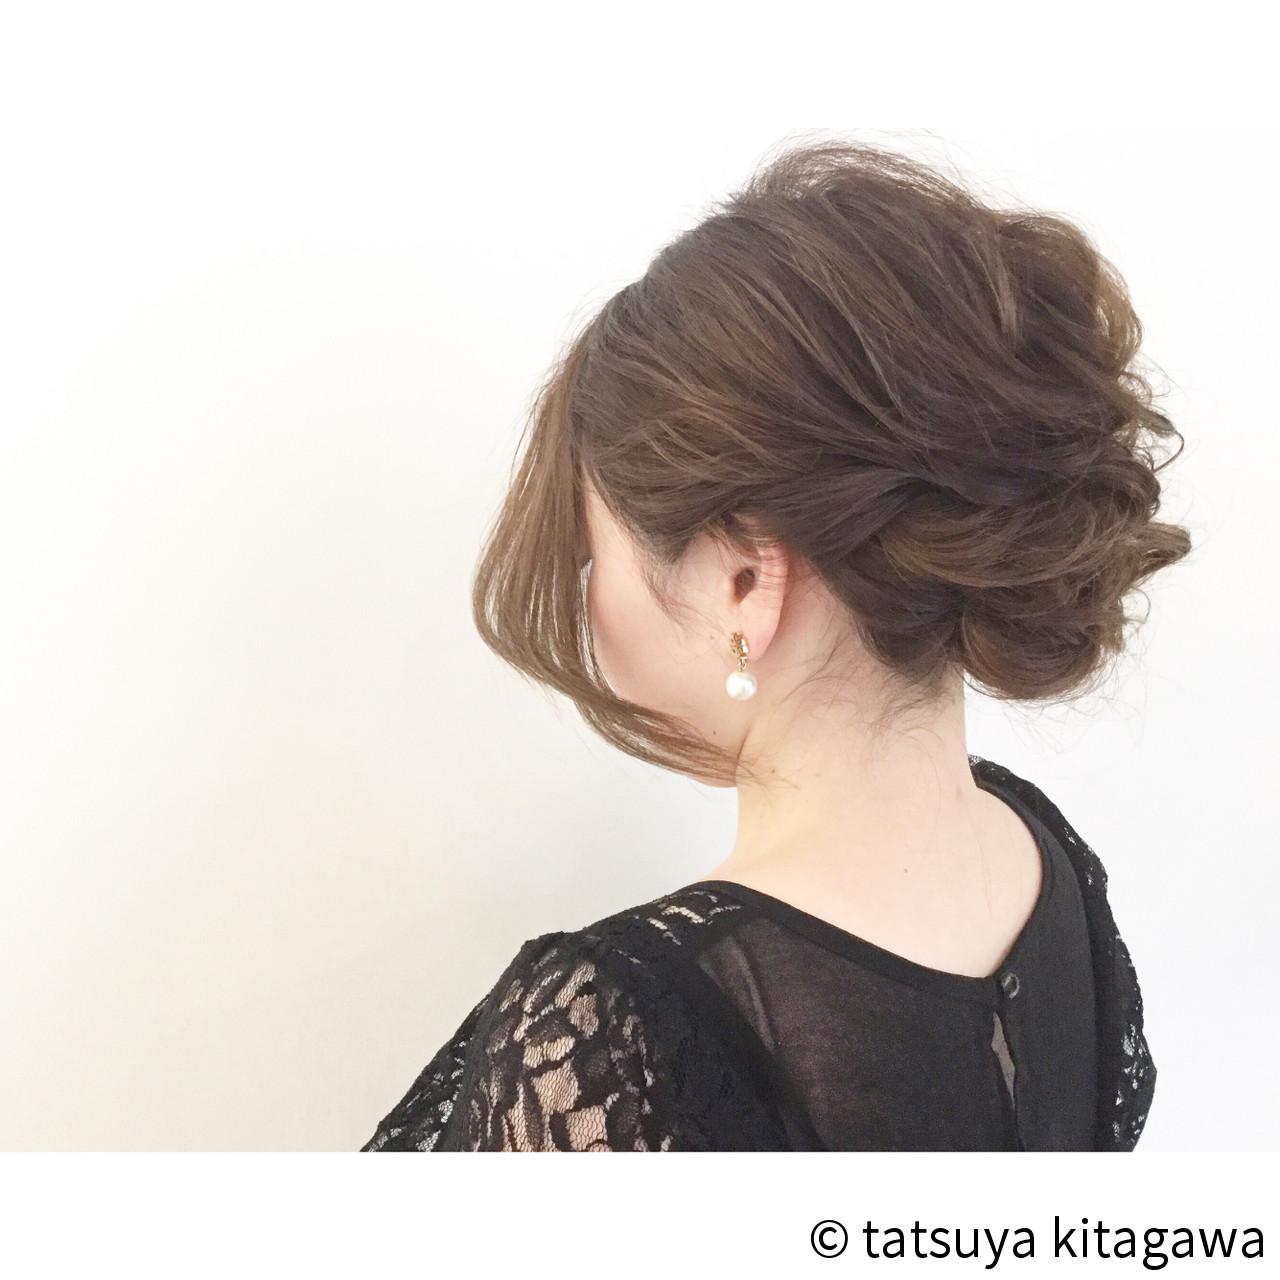 today's hair style☆クラリール . 外国人風スタイル☆ ルーズかつシンプルに♪ . HAIR: @ta2tatsu